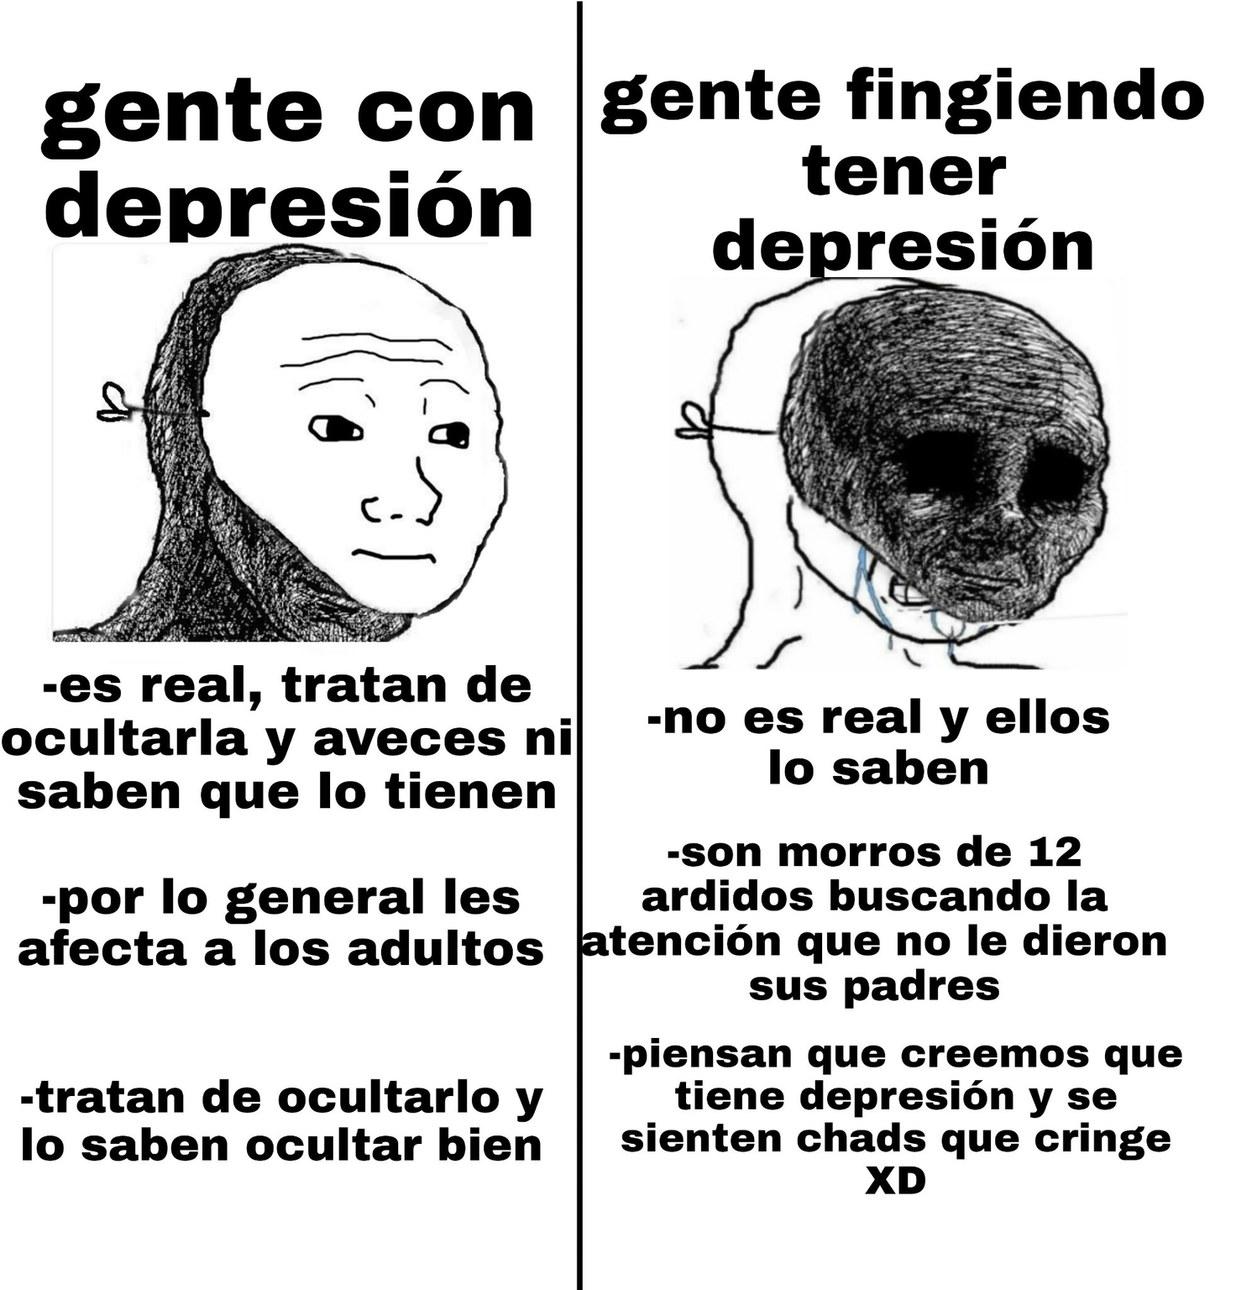 """Denme atención tengo depresión :chad:"" - meme"